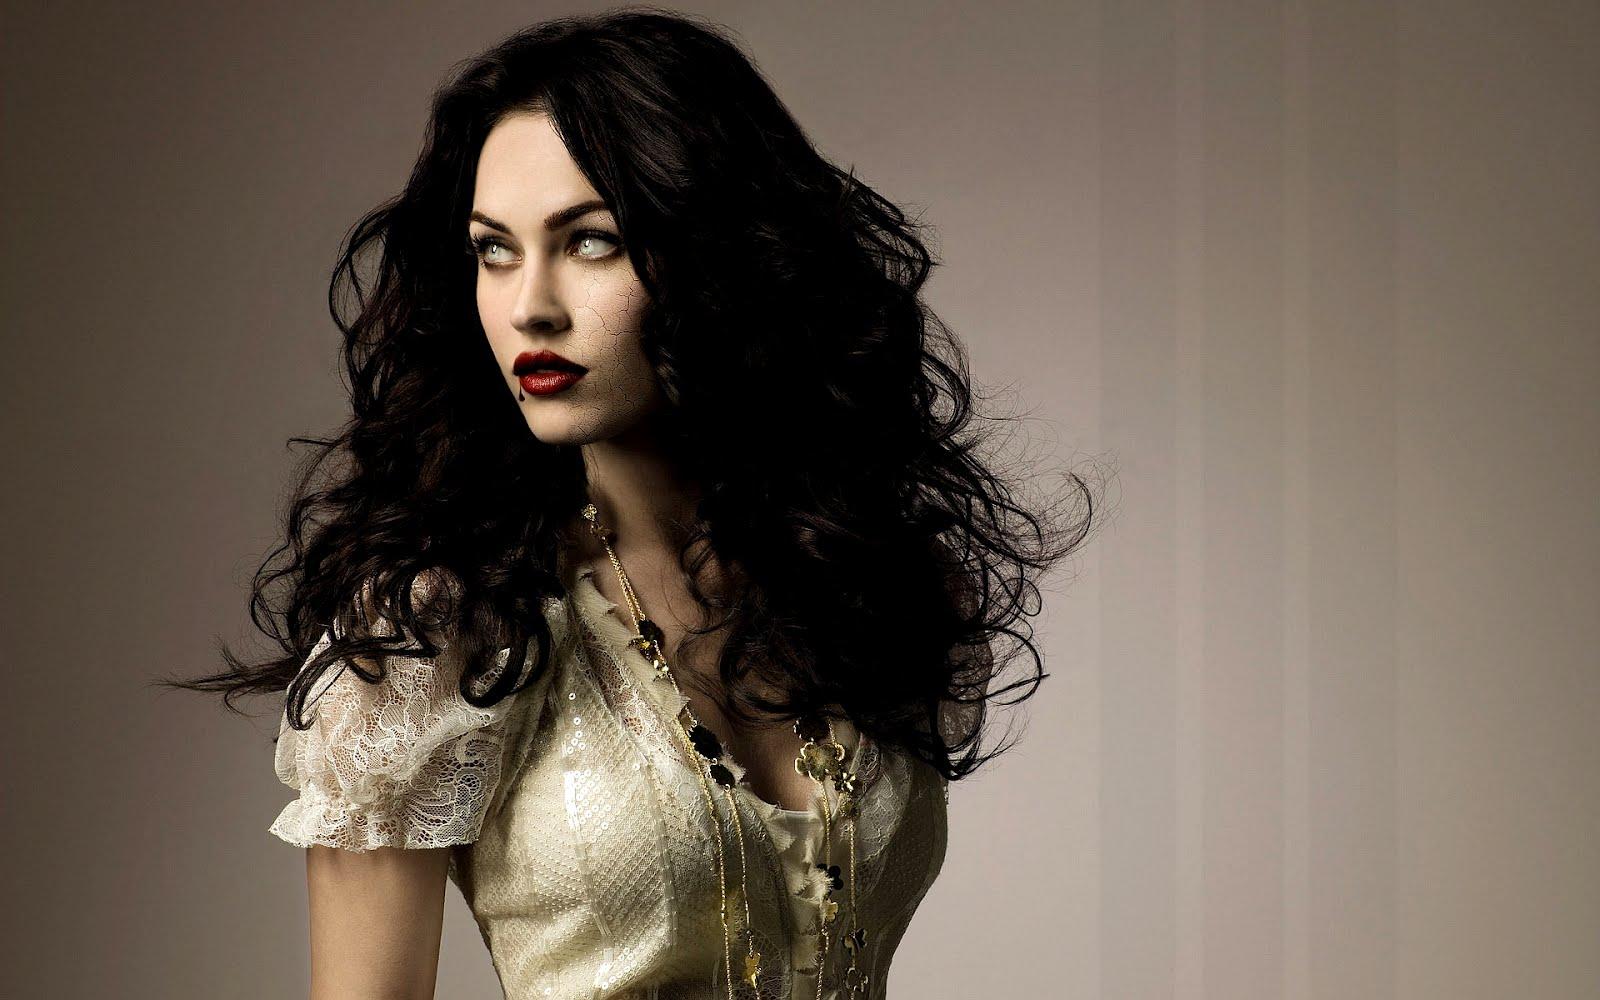 http://2.bp.blogspot.com/-XRj-t8tdANU/T4wrh39QkBI/AAAAAAAAA-4/rENhyQNaVUg/s1600/megan_fox_vampira_vampiresa_01.jpg